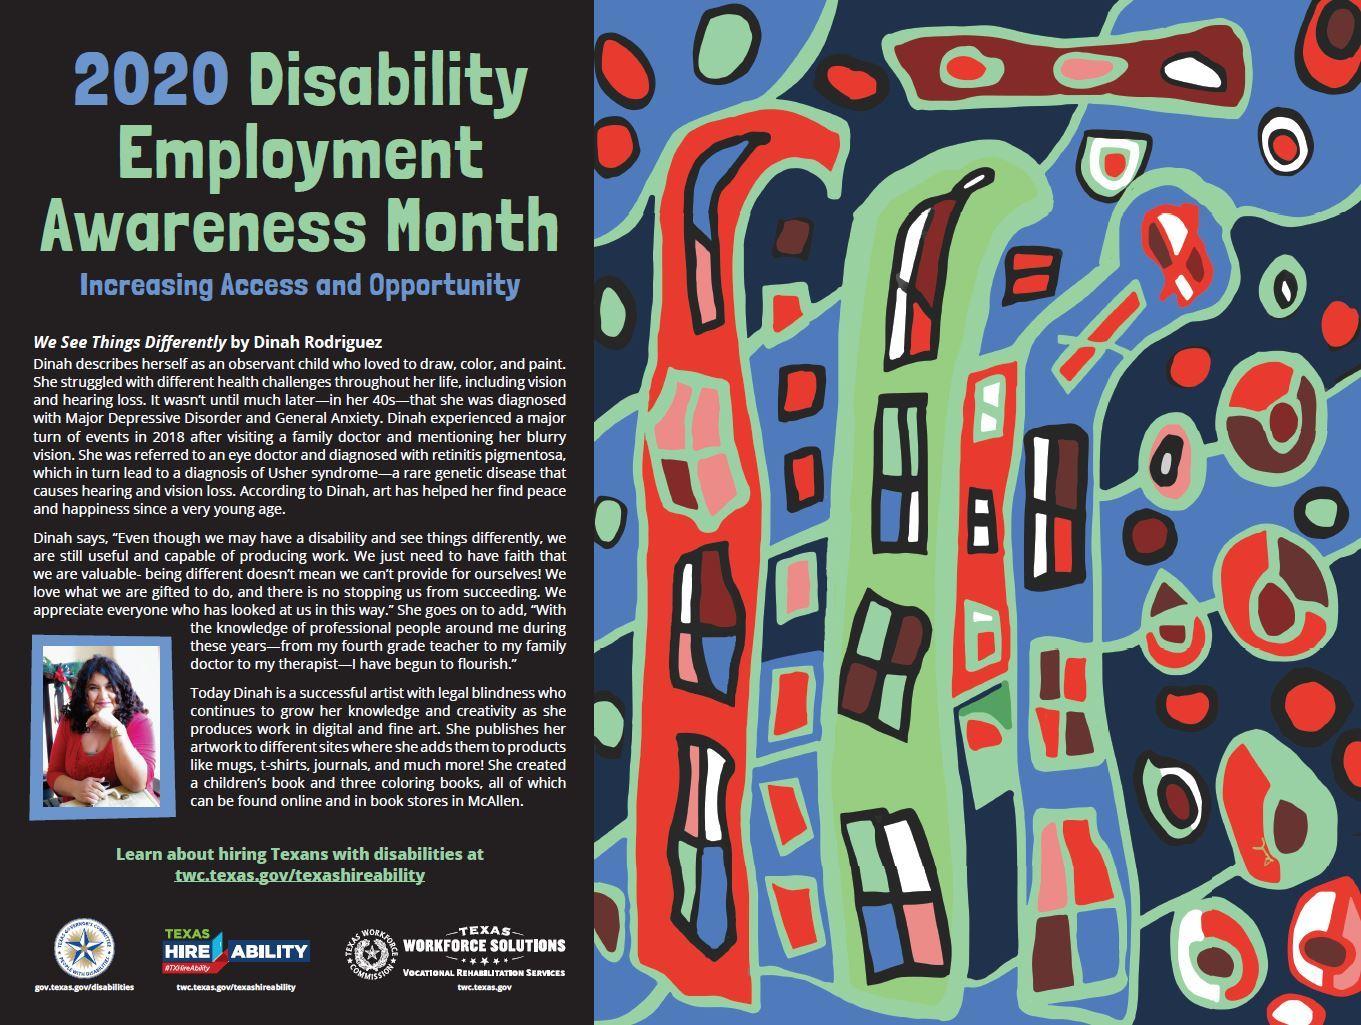 2020 Disability Employment Awareness Month